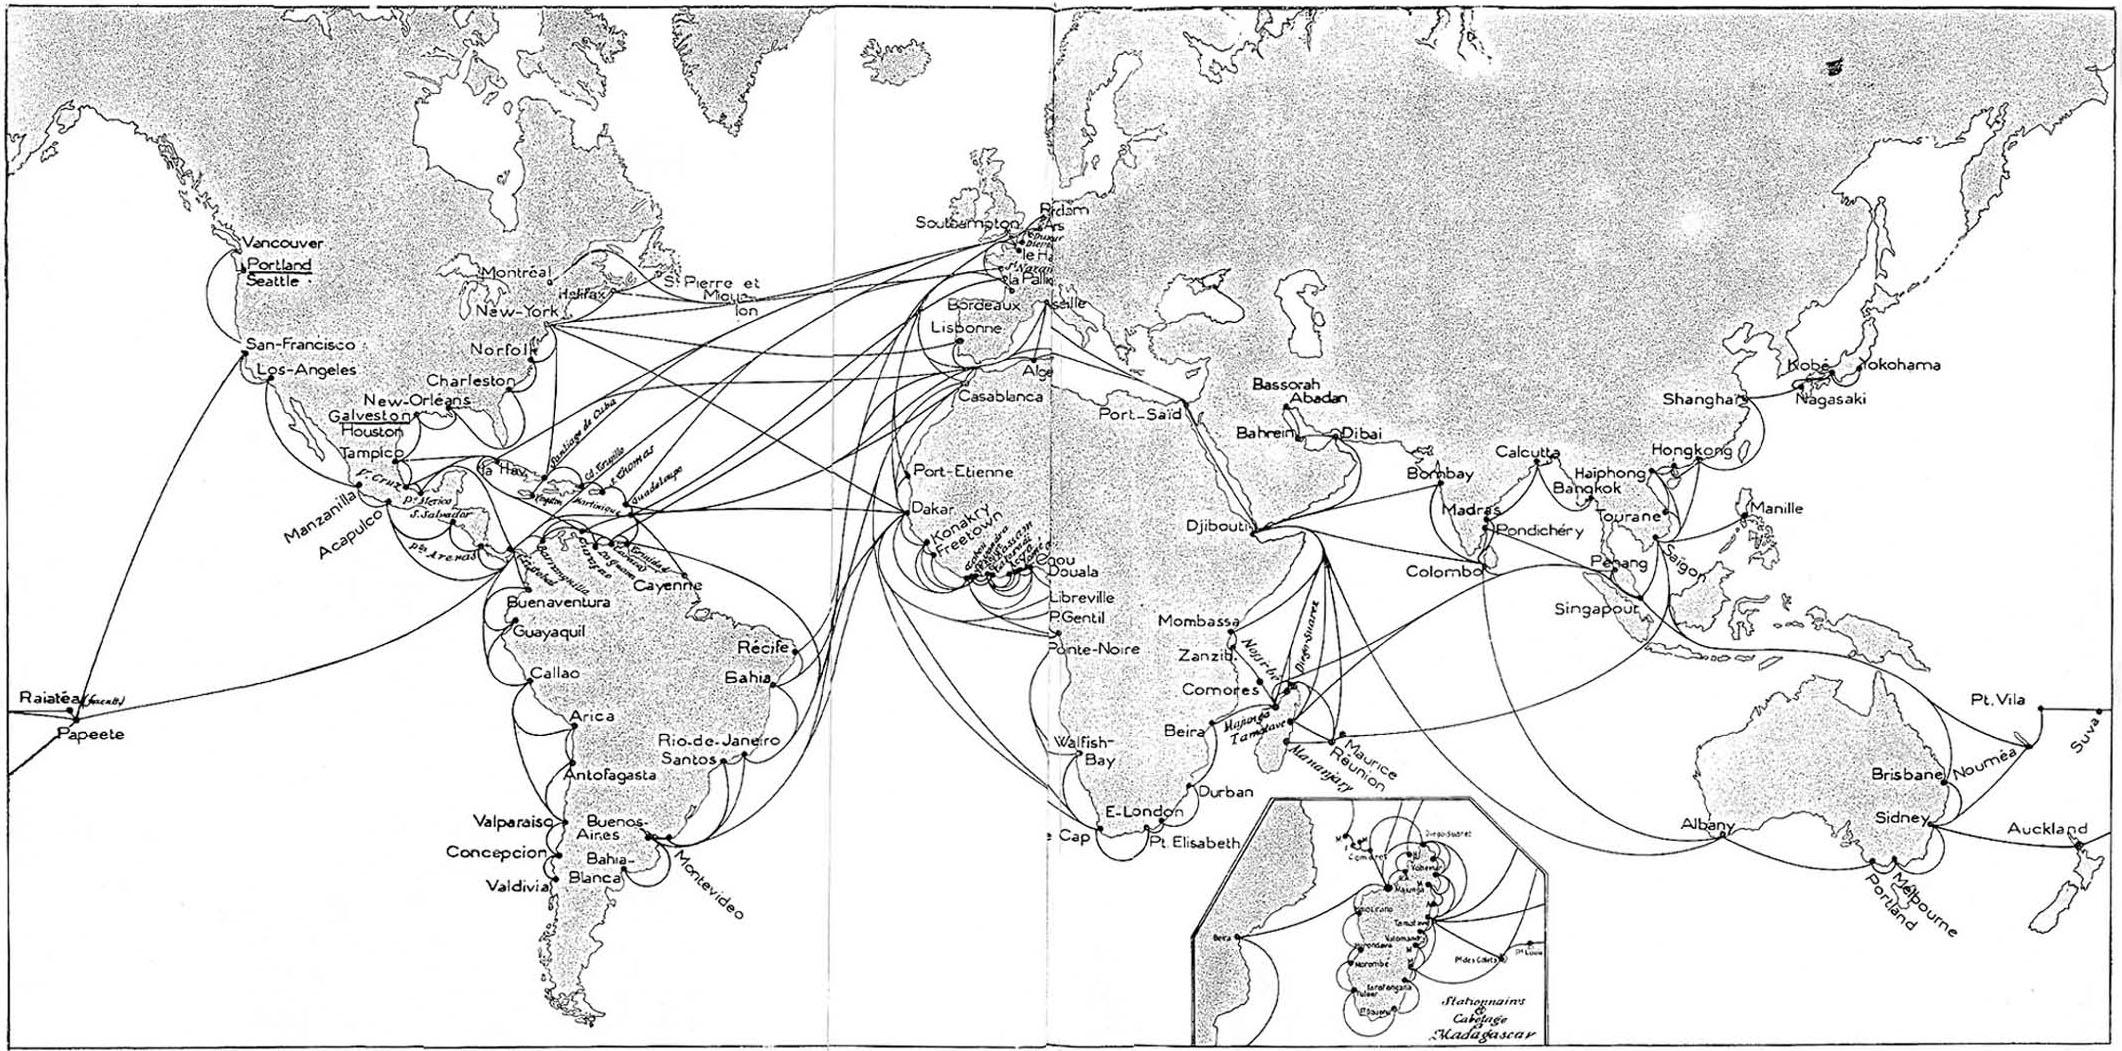 les grandes mutations de la marine marchande fran u00e7aise